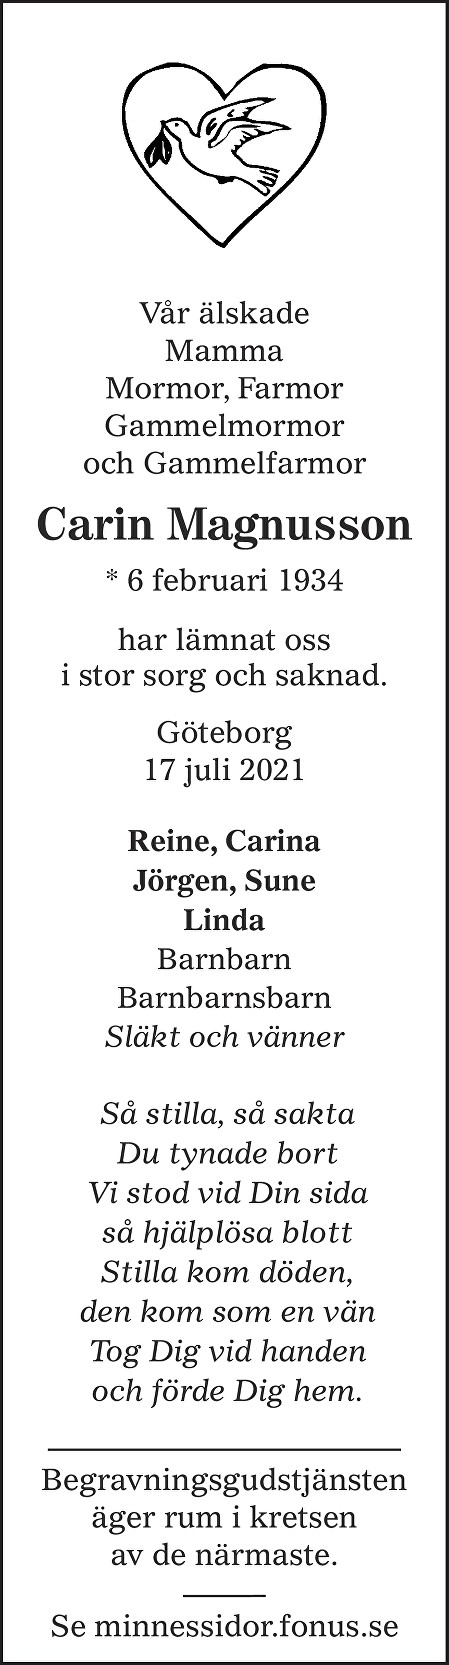 Carin Magnusson Death notice